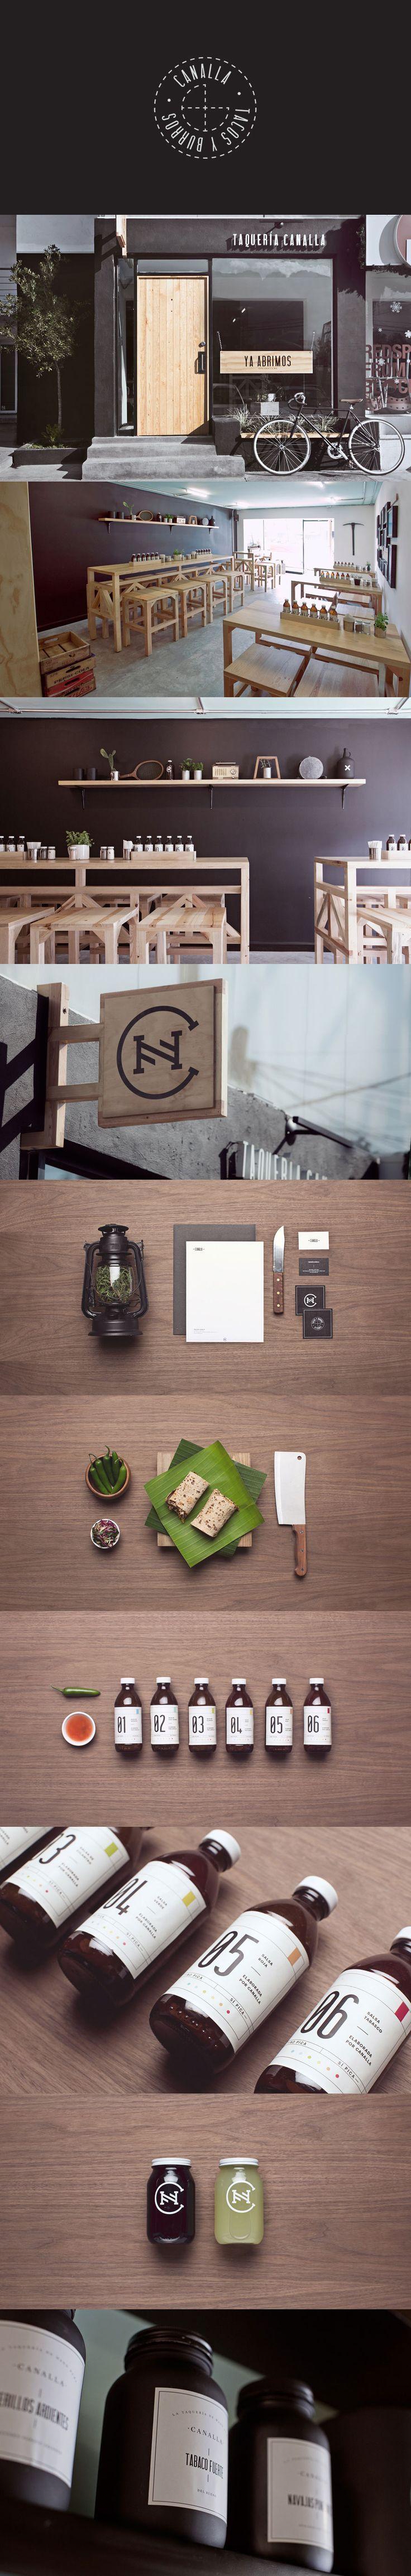 Taquería Canalla Branding, Signage, Interior, Packaging | Manifiesto Futura